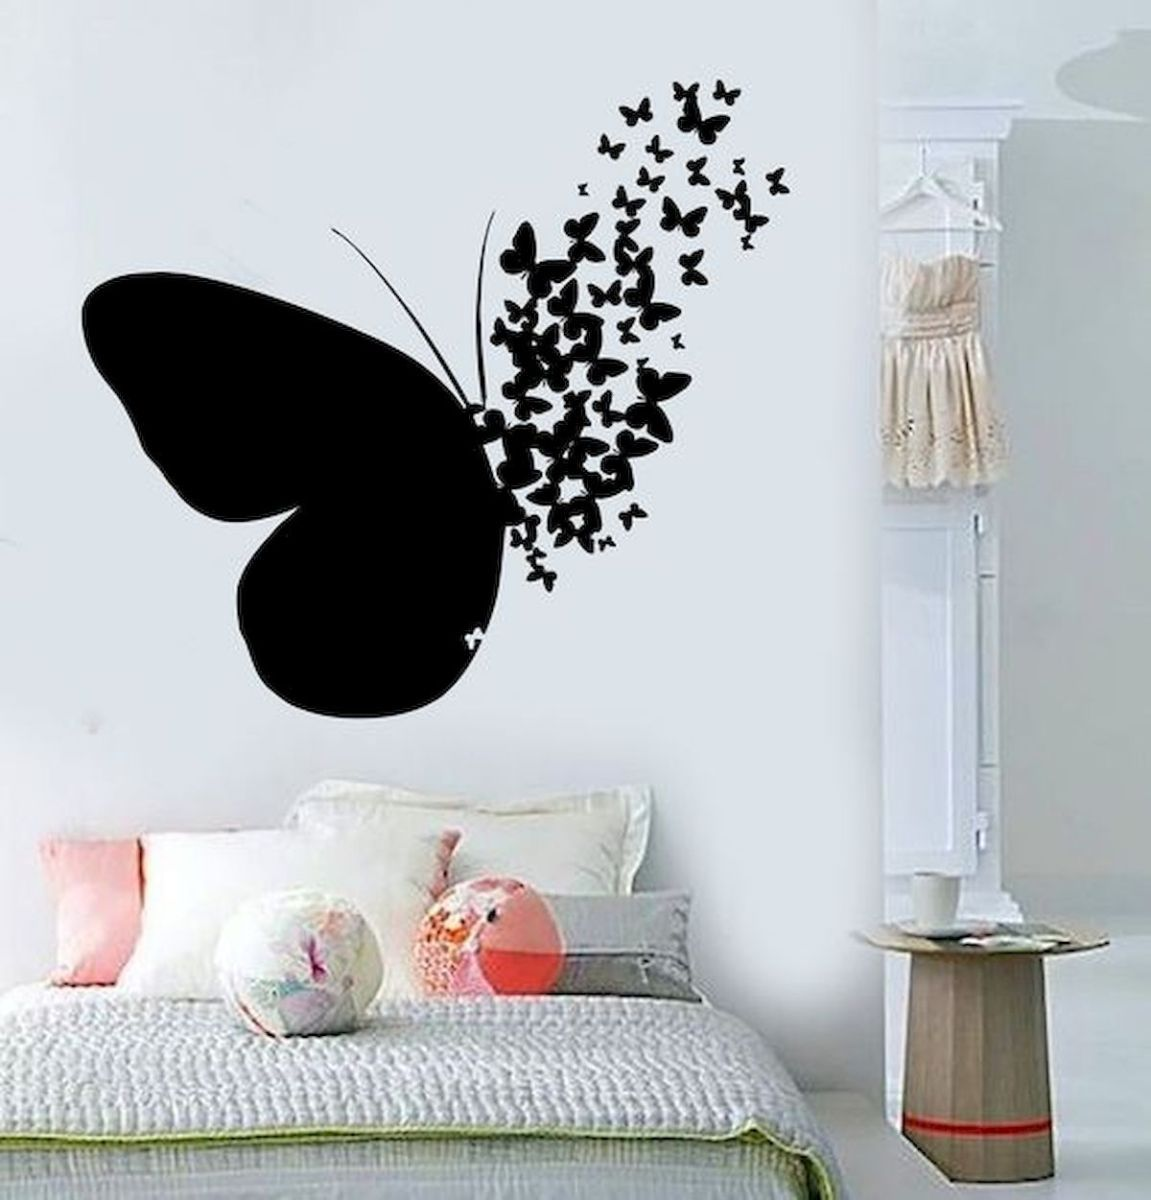 50 Unique Wall Art Ideas So Artsy 1 Wall Stickers Bedroom Diy Wall Painting Wall Decor